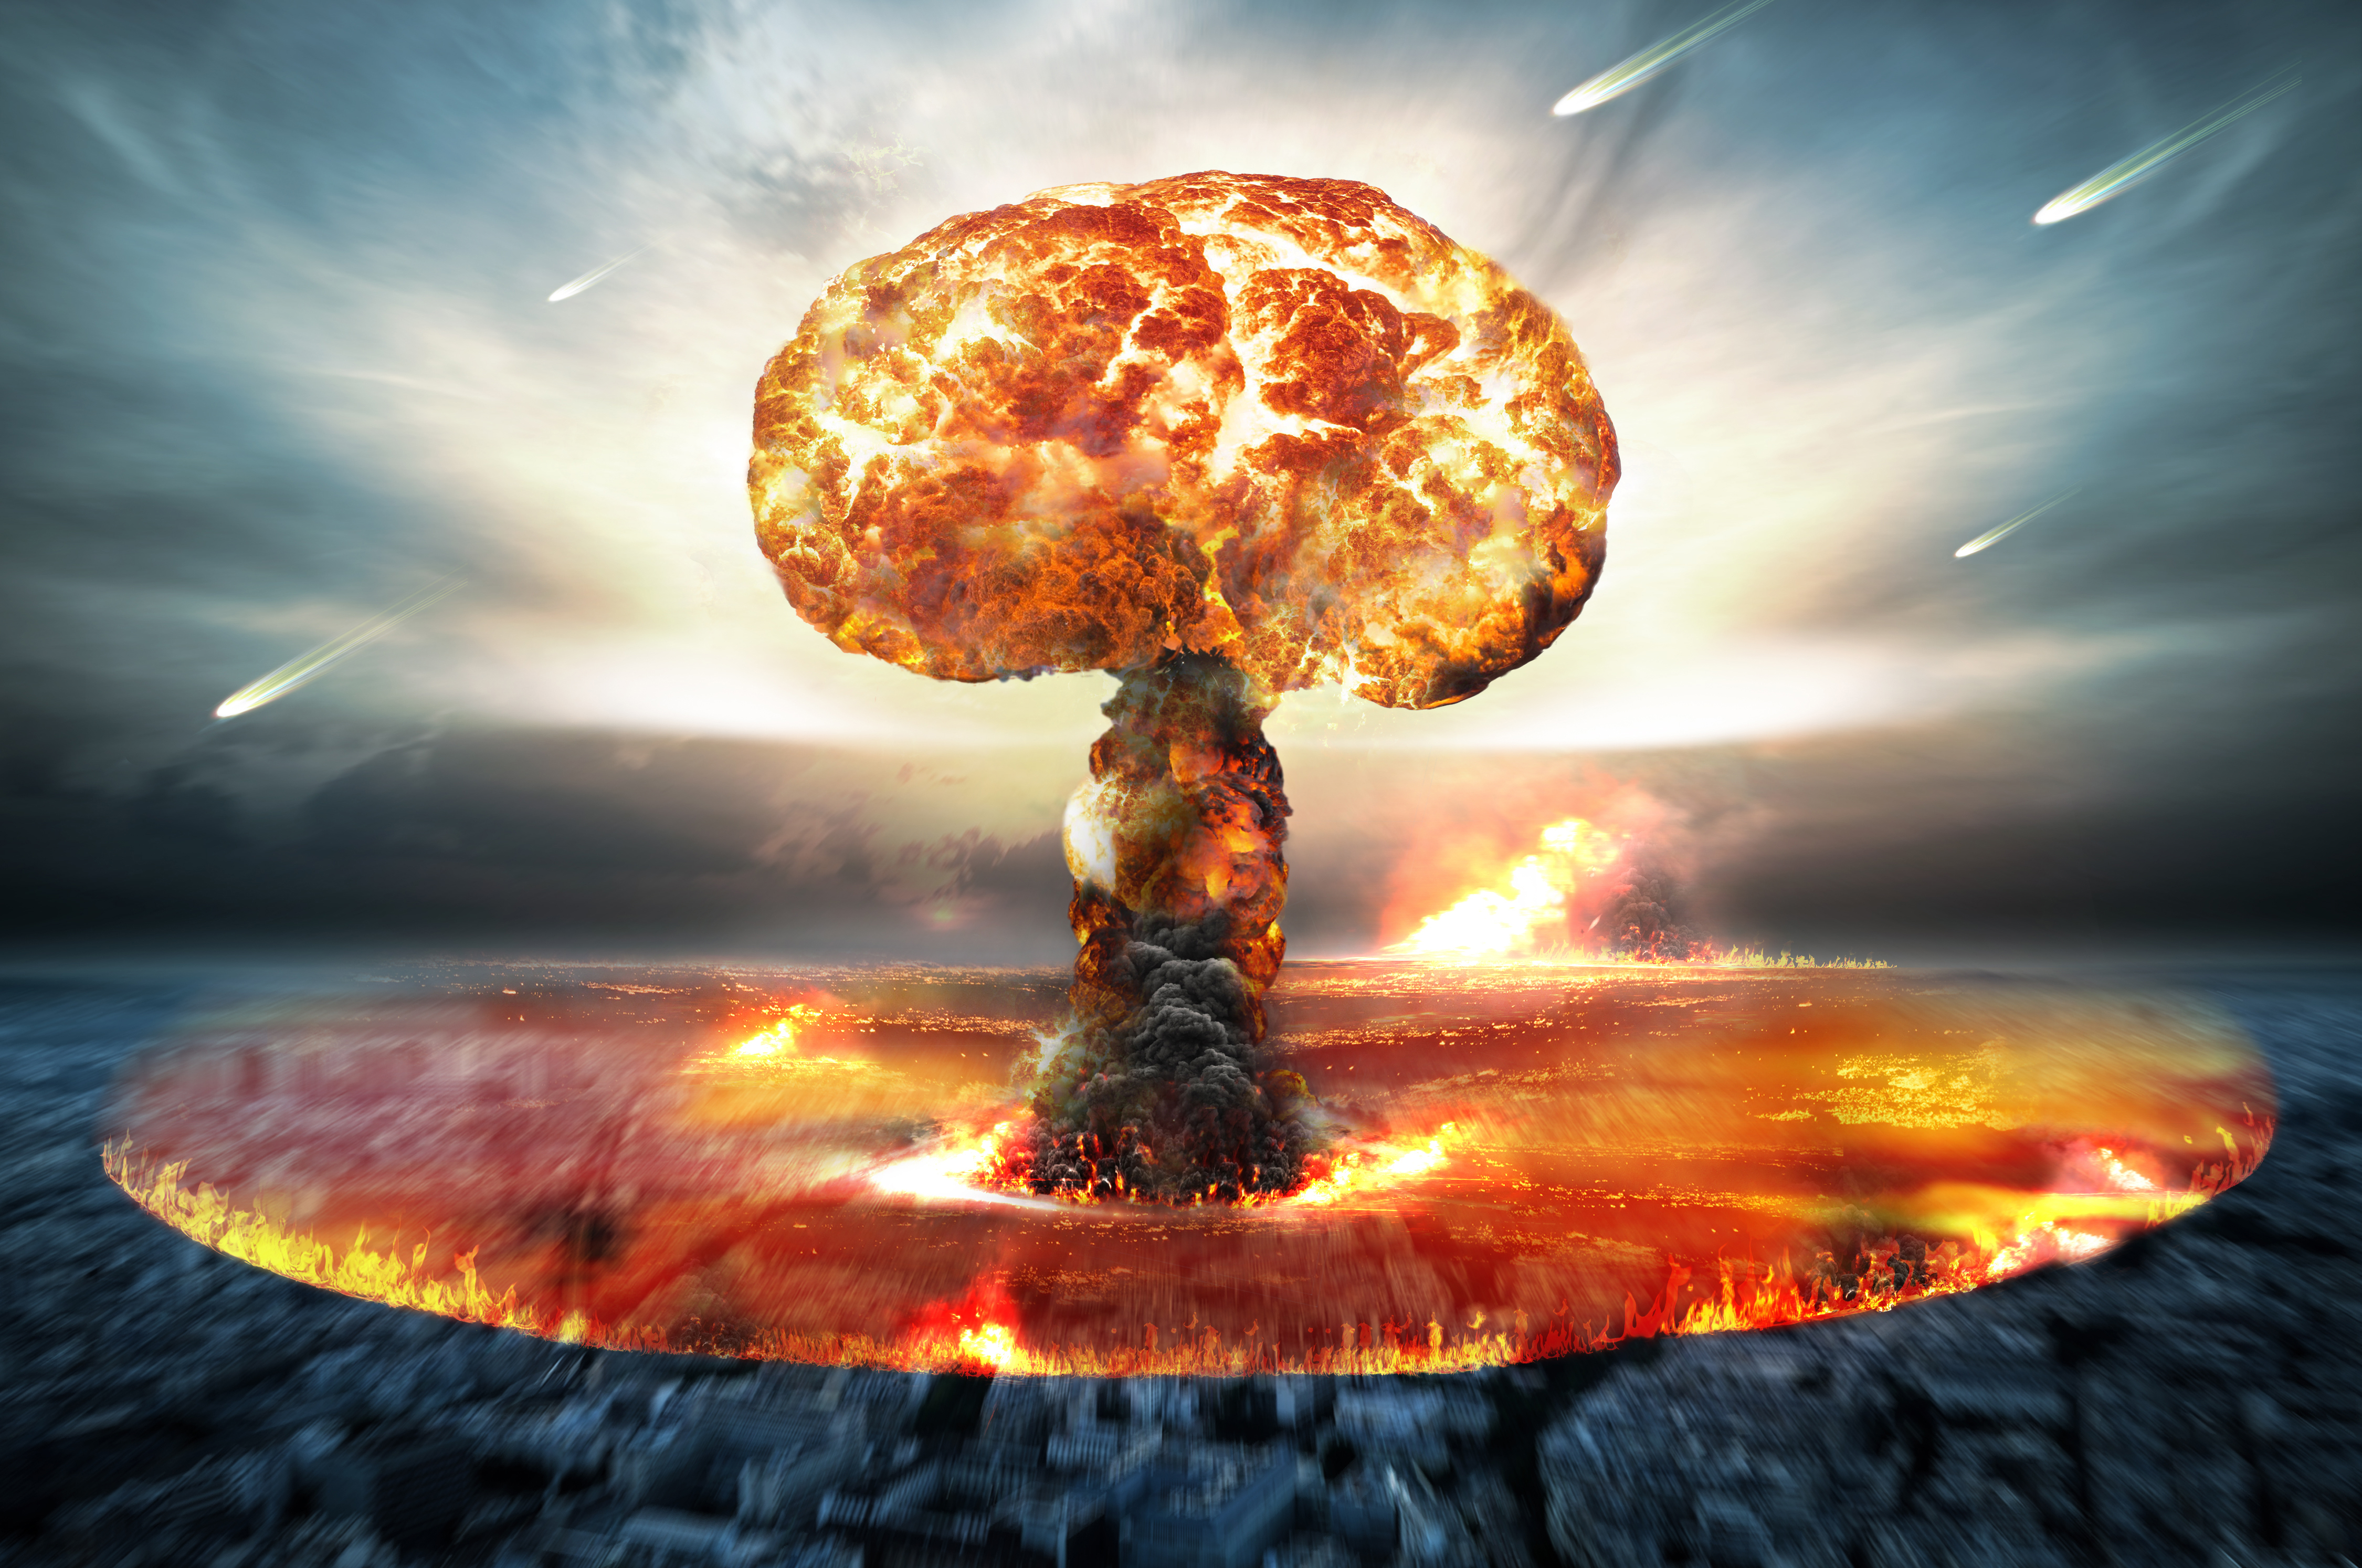 Explosions_nuclear_bomb_483839.jpg